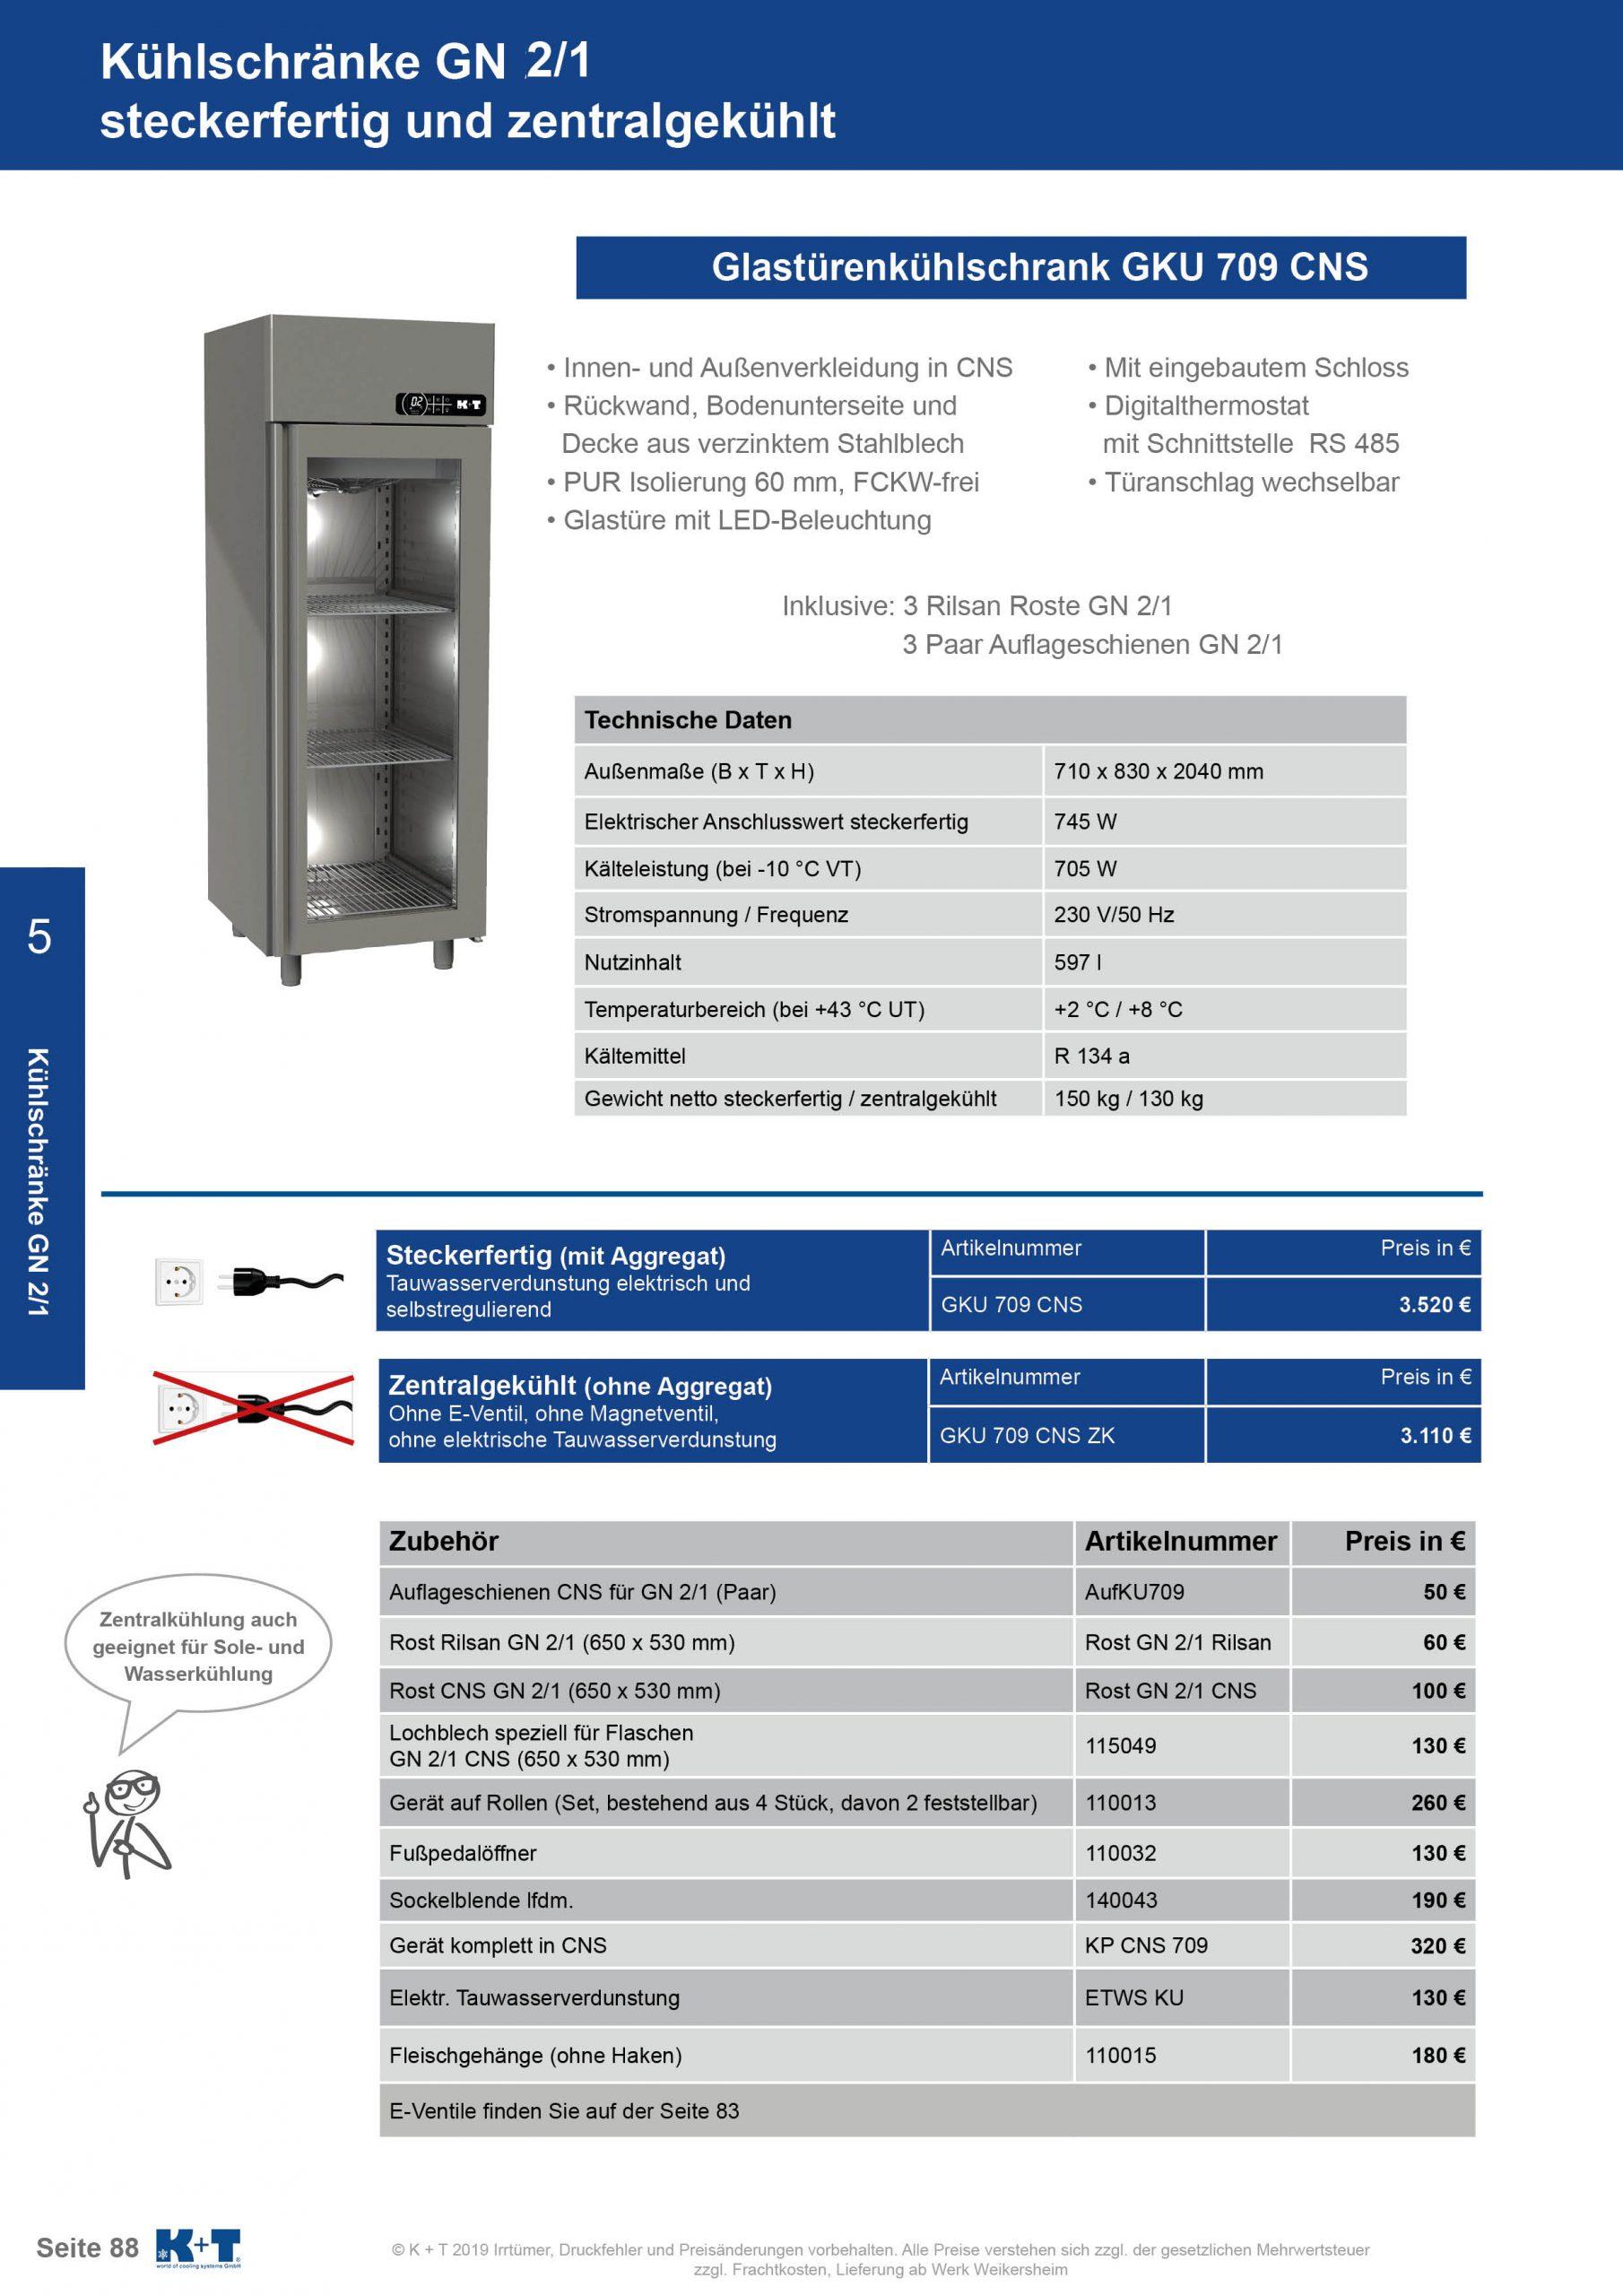 Kühlschränke GN 2_1 Glastürenkühlschrank zentralgekühlt